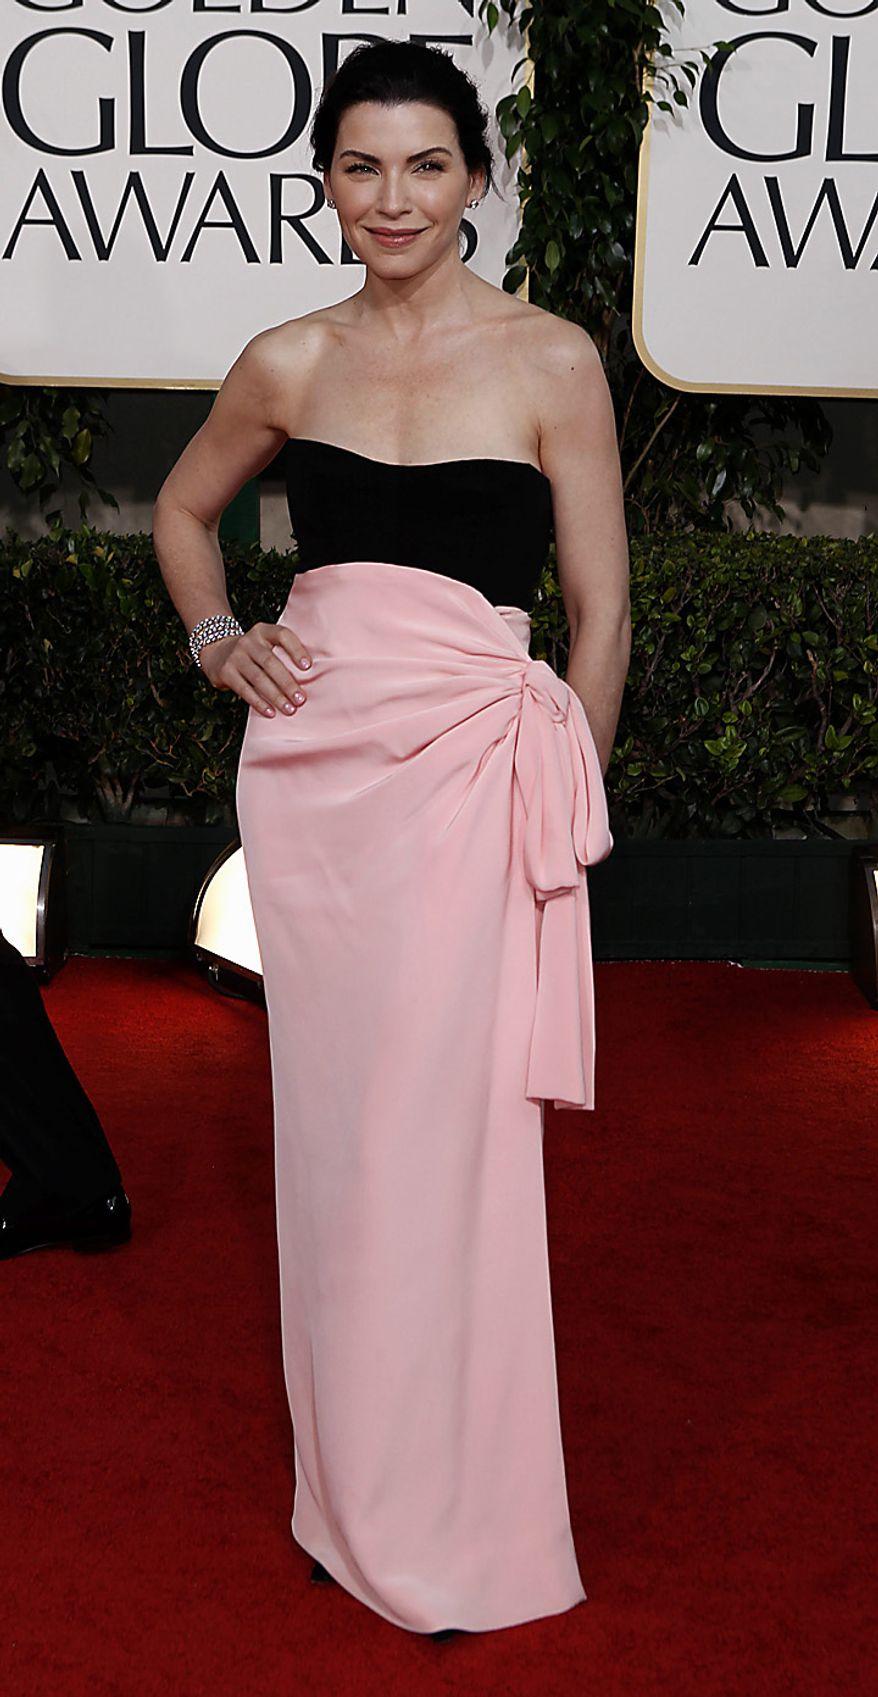 Julianna Margulies arrives for the Golden Globe Awards Sunday, Jan. 16, 2011, in Beverly Hills, Calif. (AP Photo/Matt Sayles)